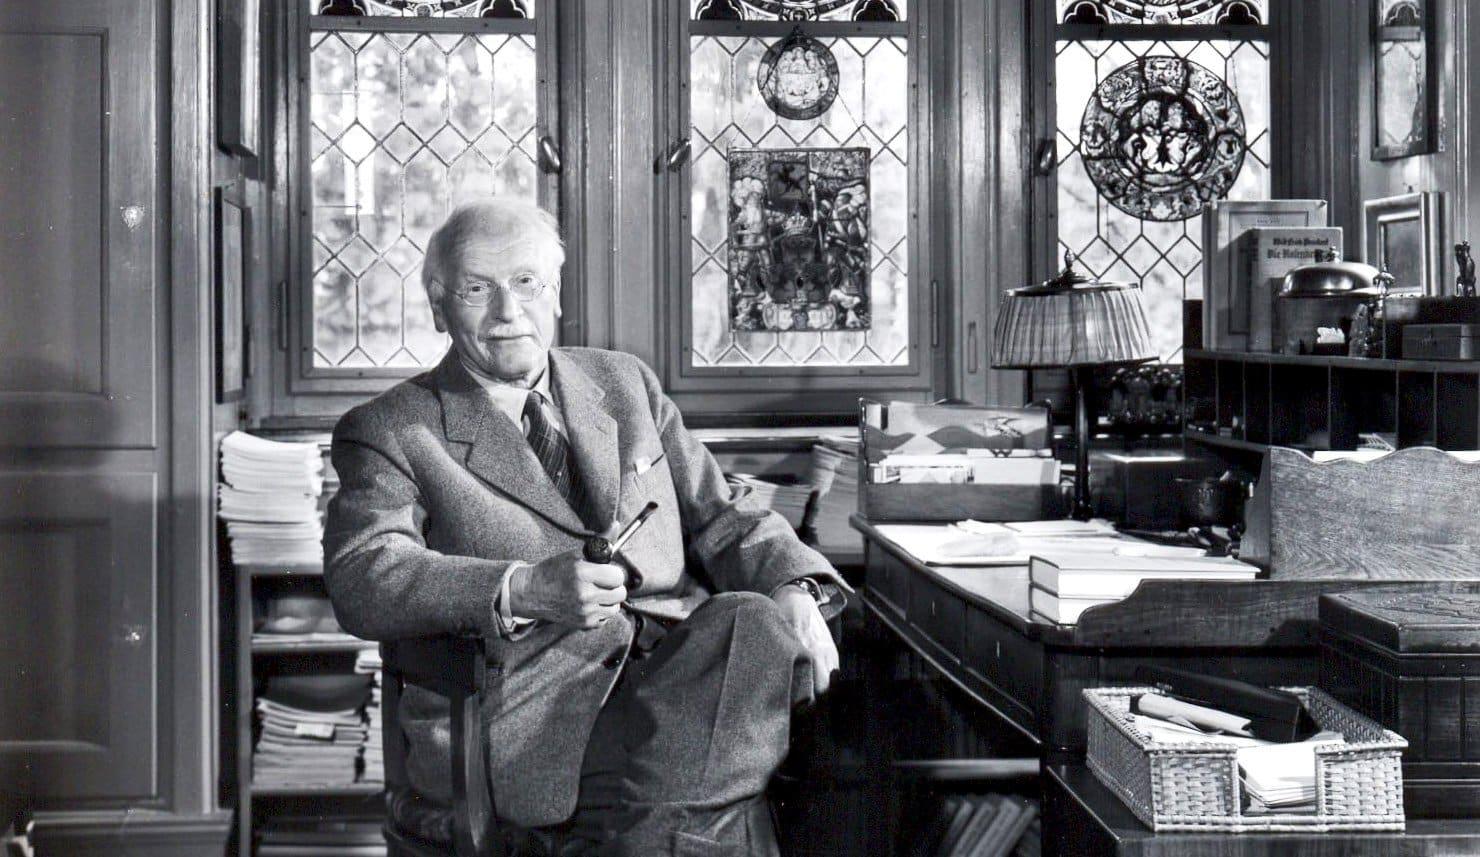 Carl Gustav Jung, sincronicità, eventi sincronici, casualità, coincidenze, psicologia